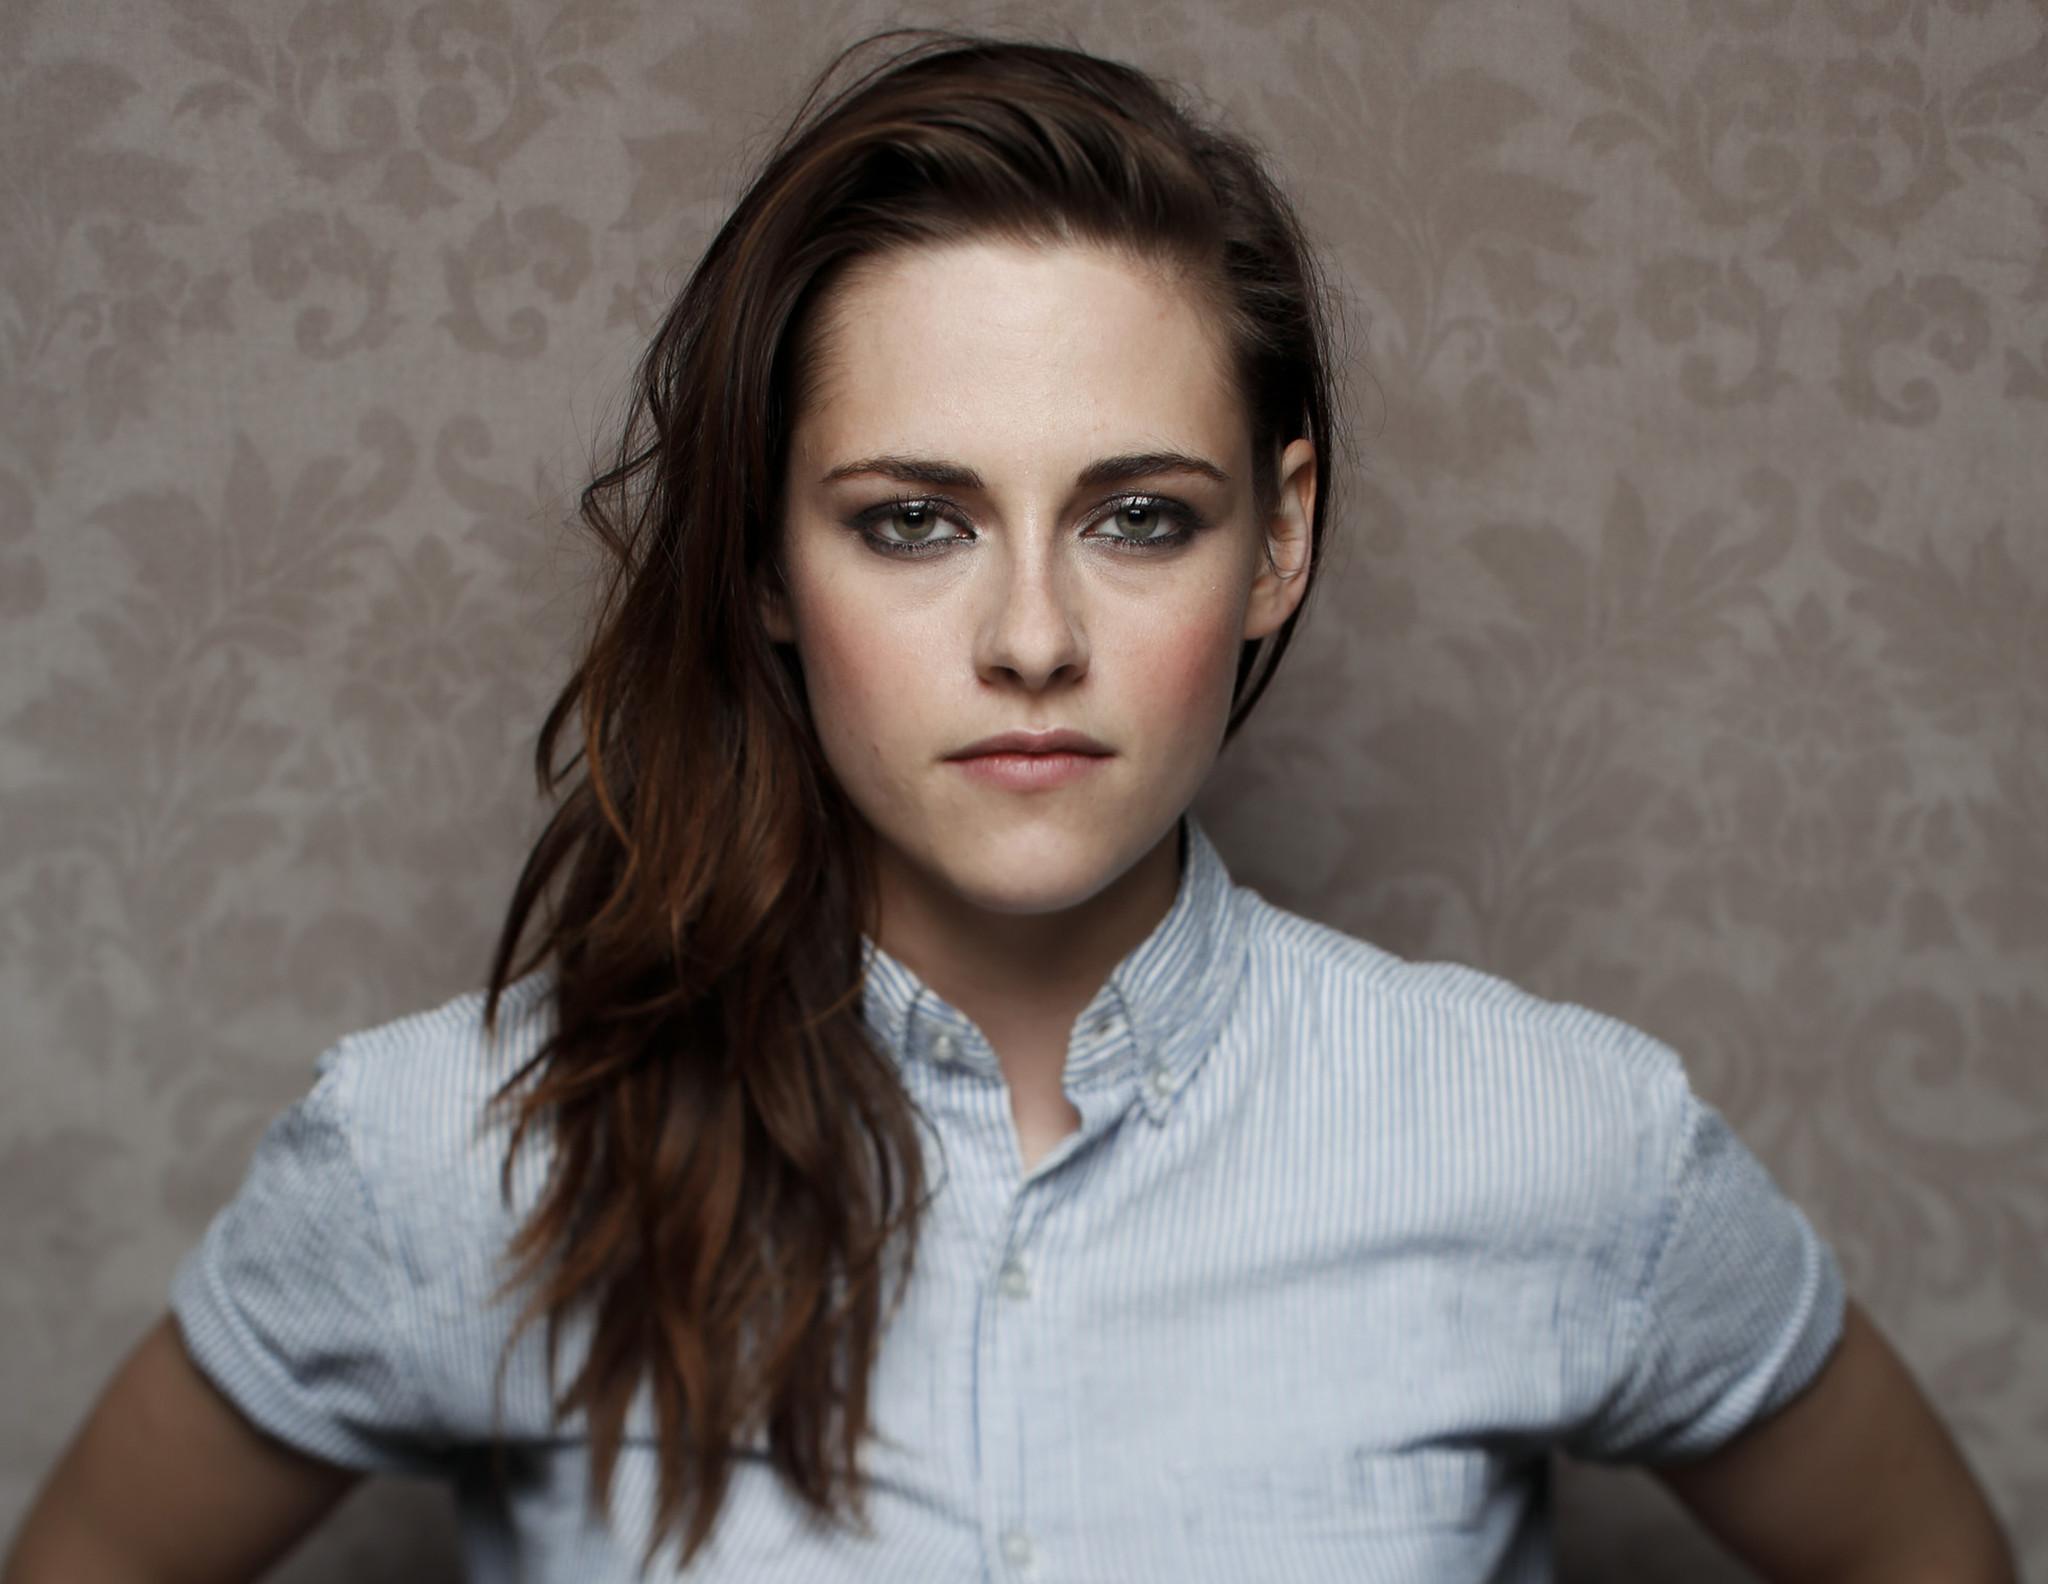 Yana Taranmış Saç Tipi: Kristen Stewart